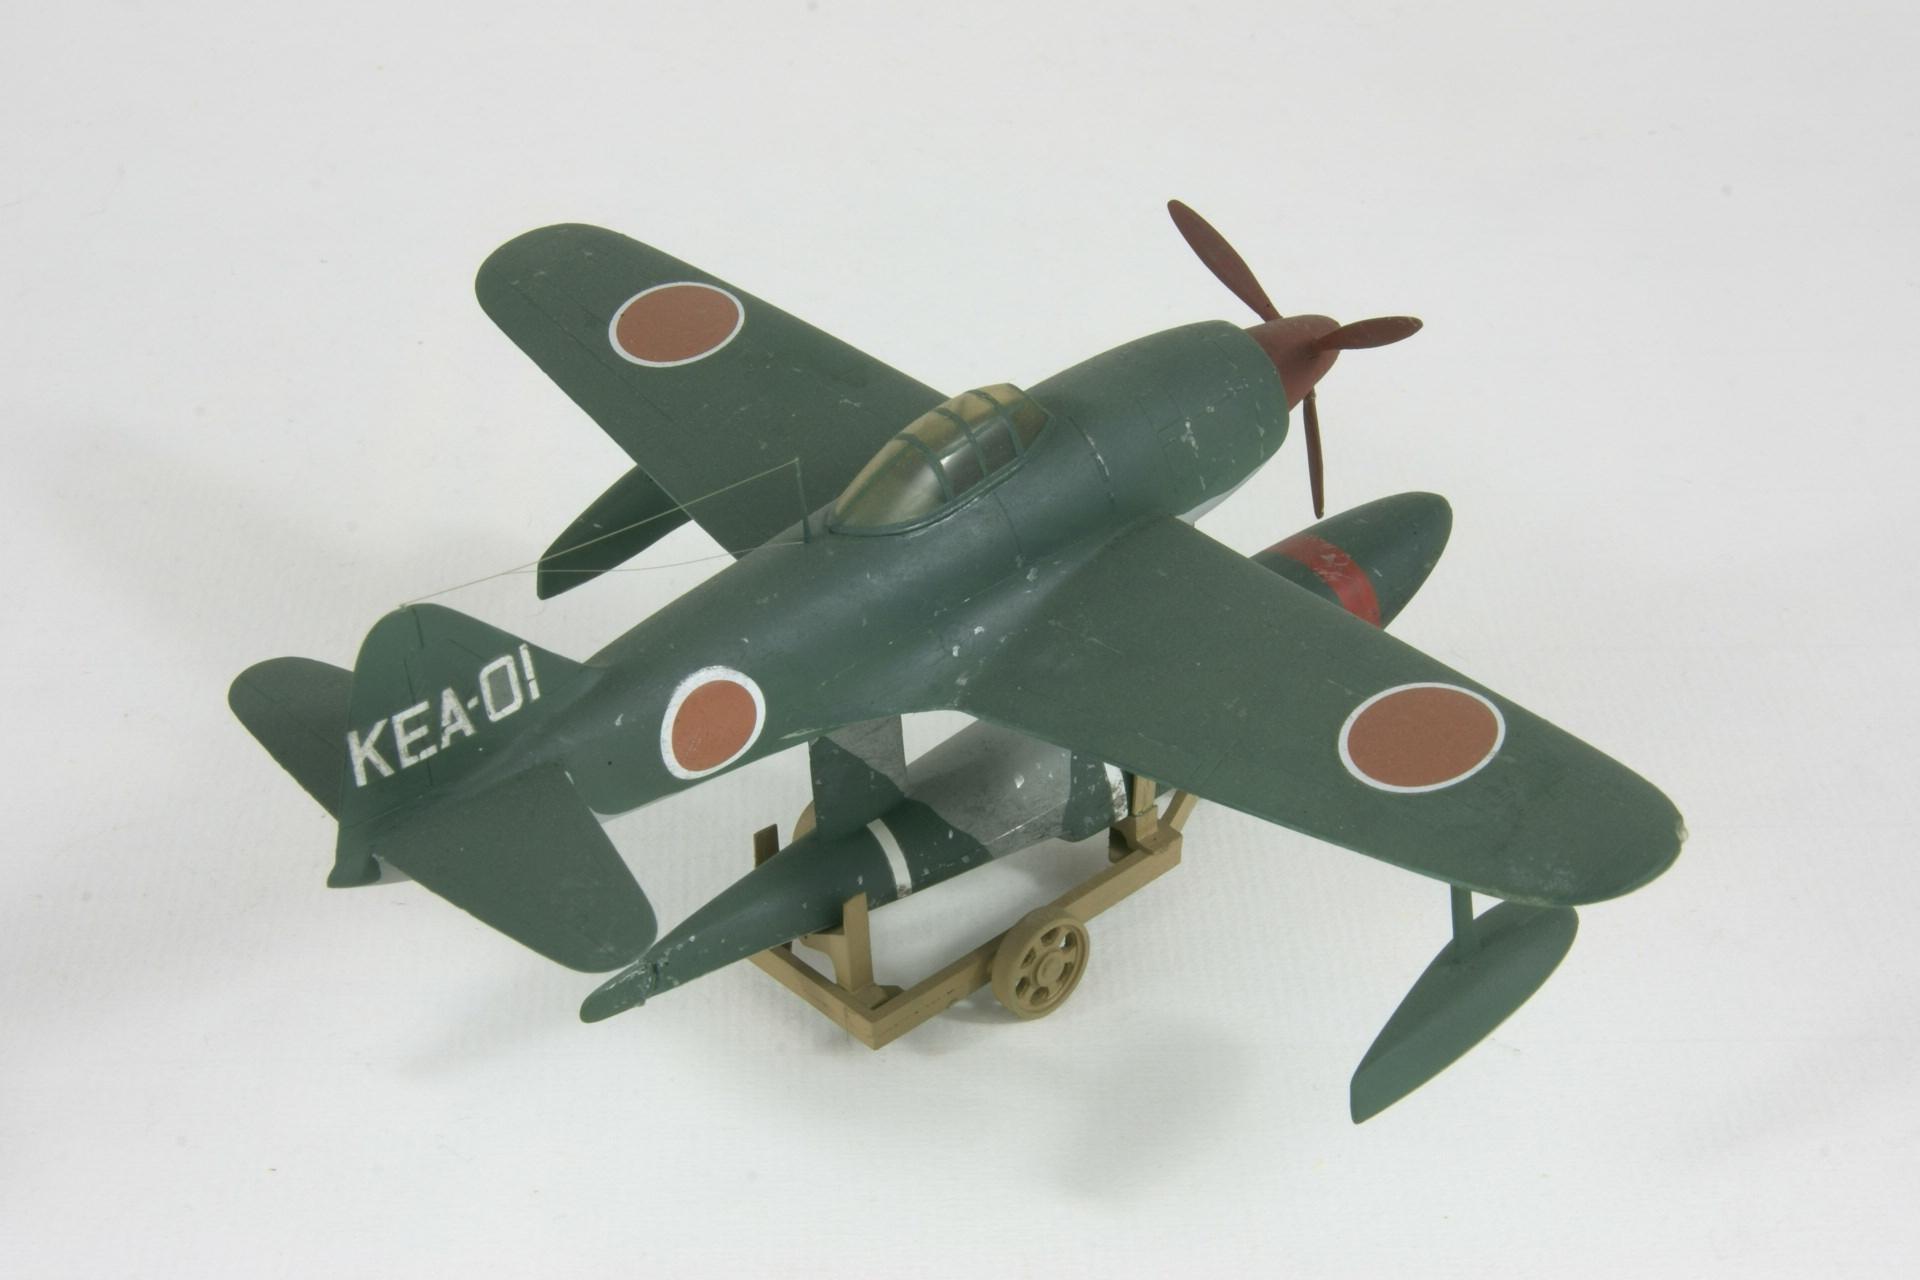 Kawanishi n1k1 rex 3 1